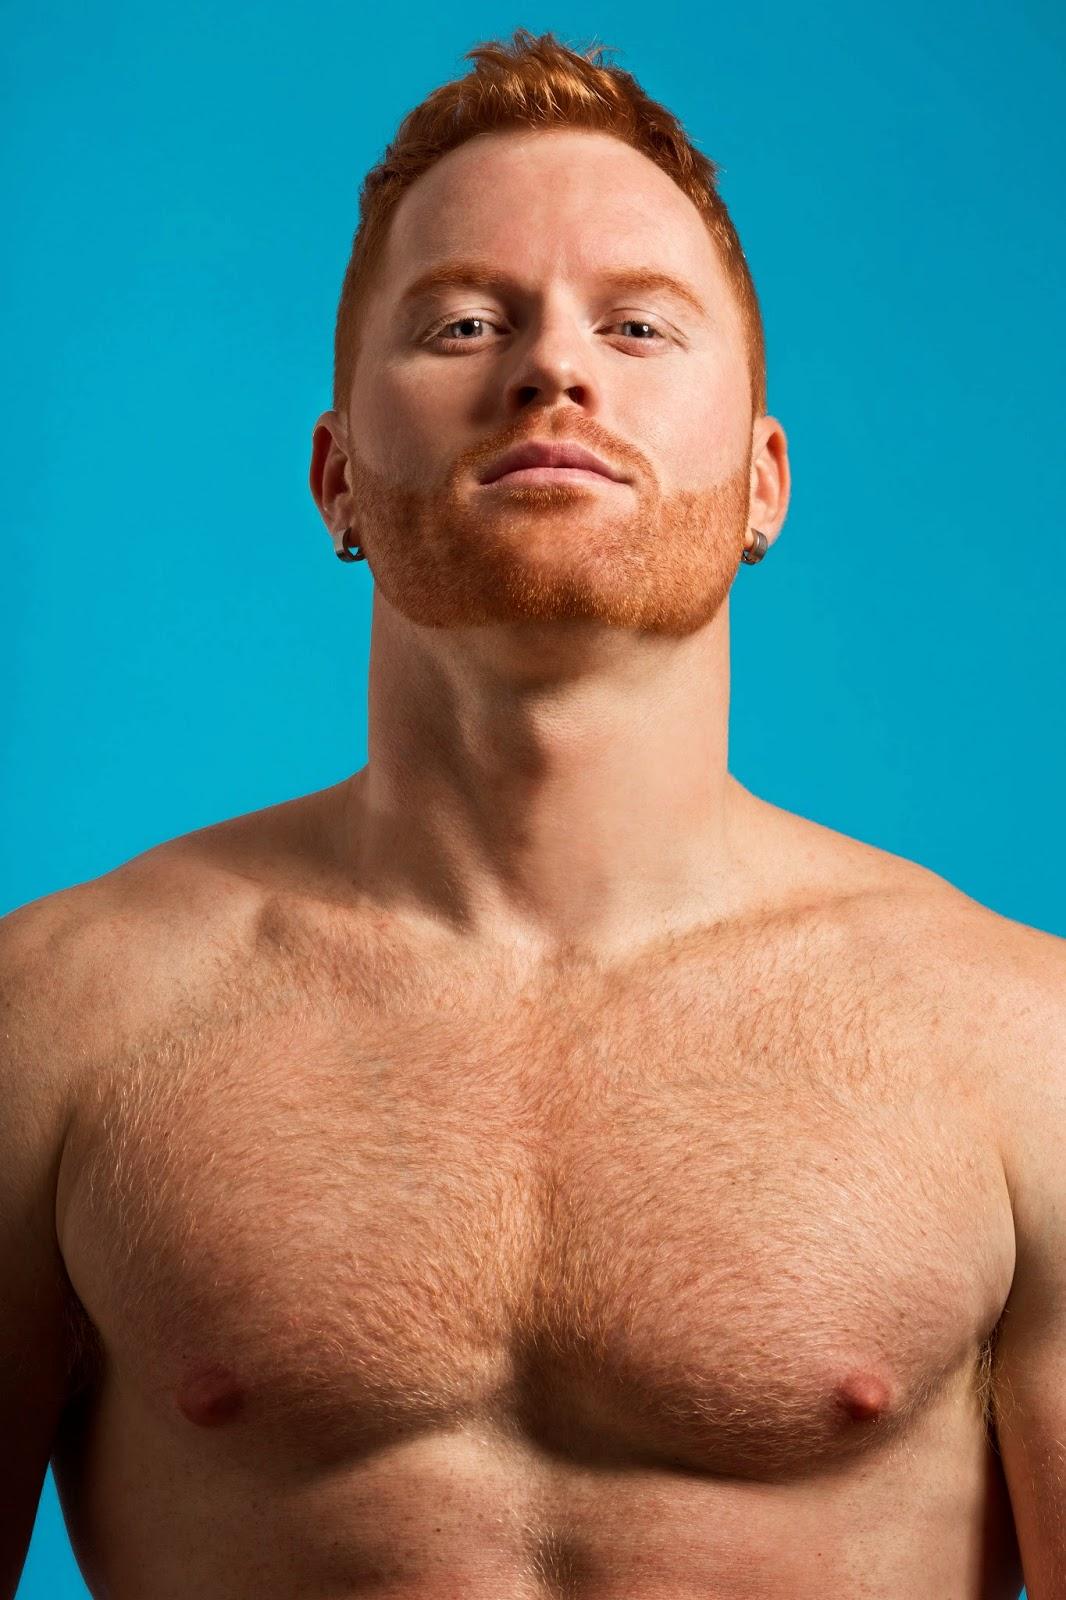 Nude men ginger